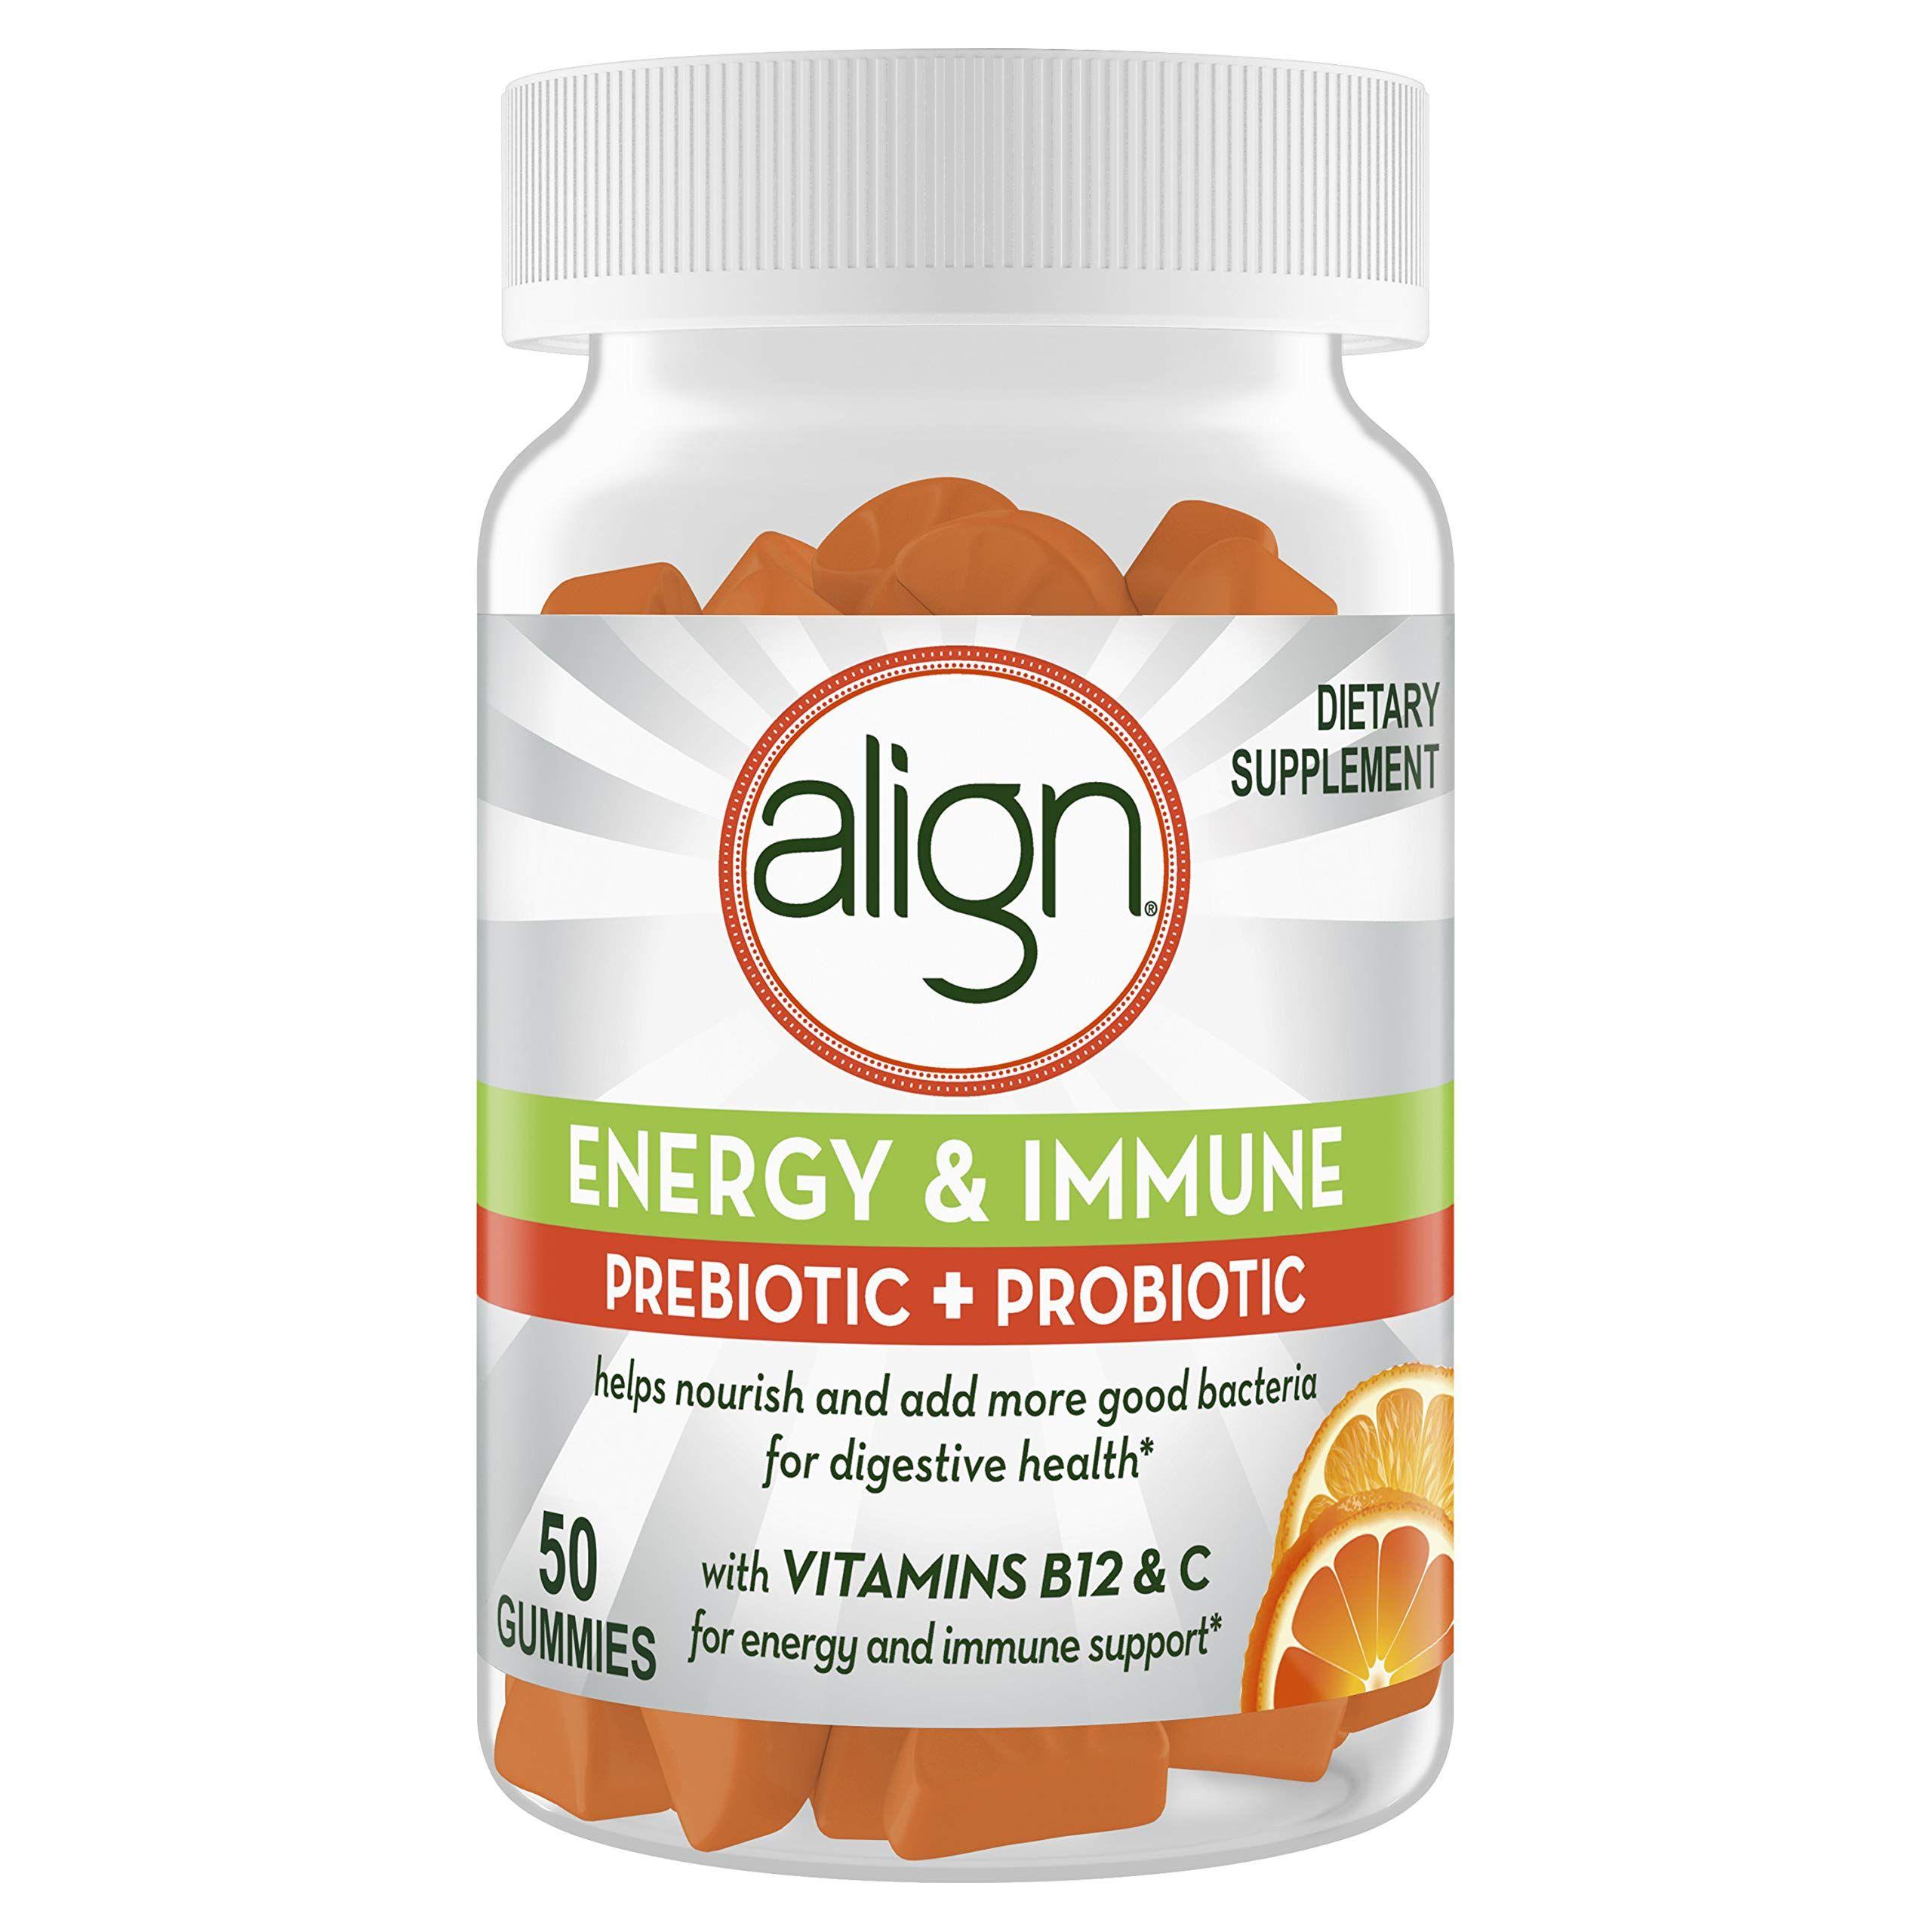 Align prebiotic probiotic supplement flavored in 2020